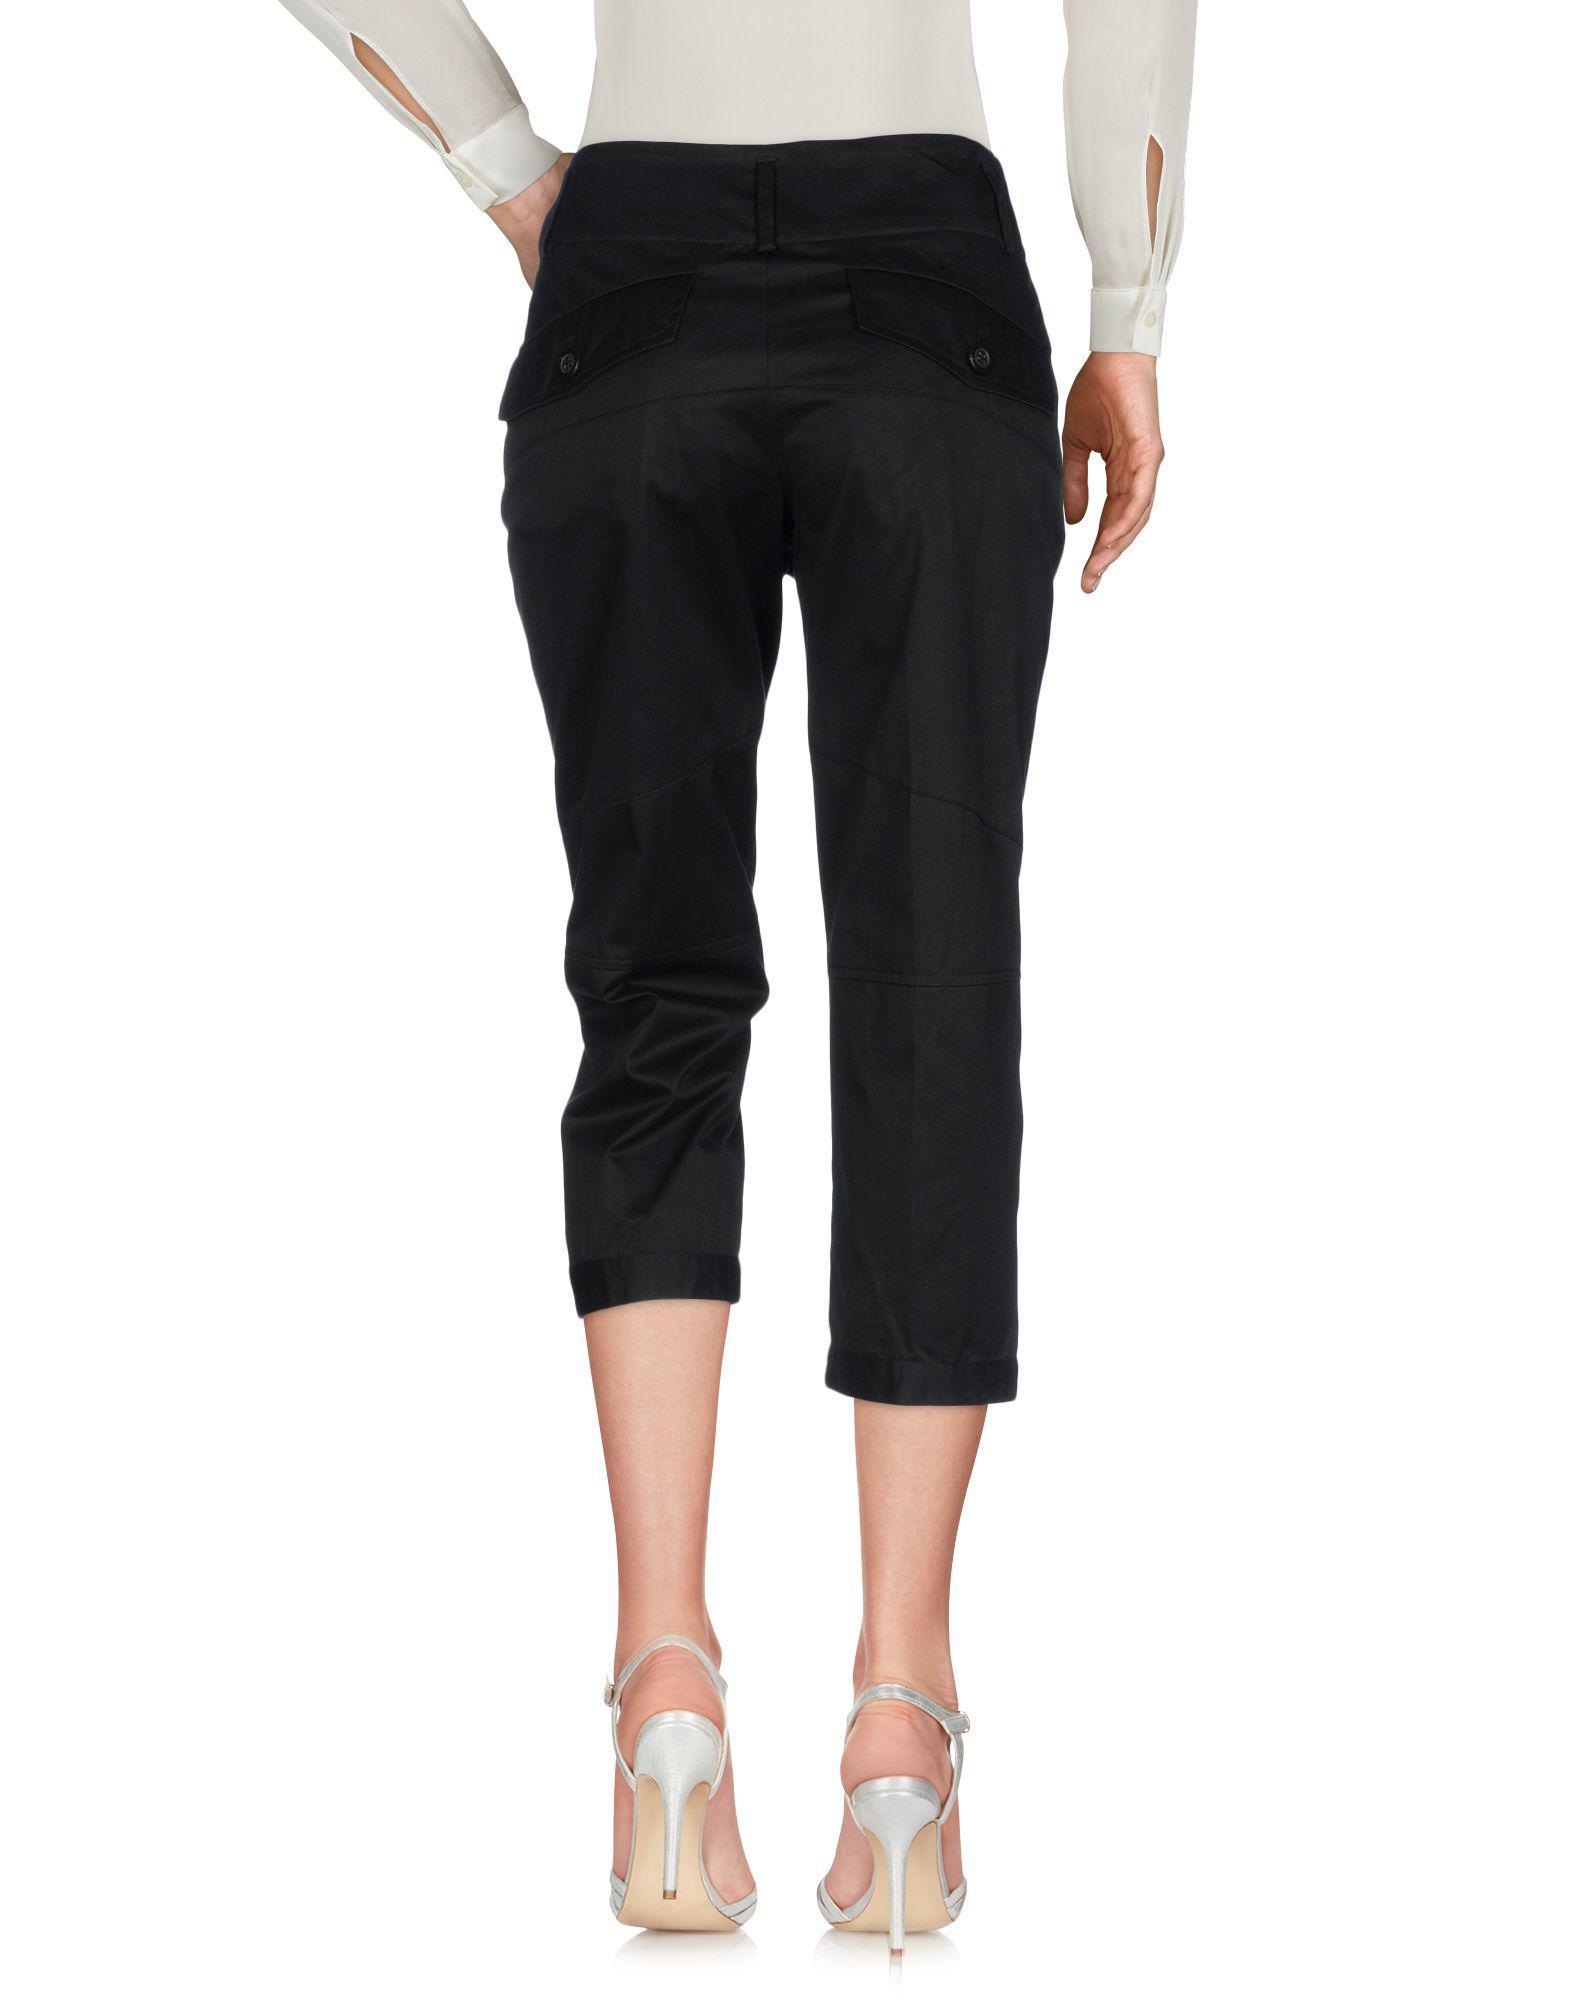 TROUSERS - 3/4-length trousers Peachoo+Krejberg u02Ct0N8sr